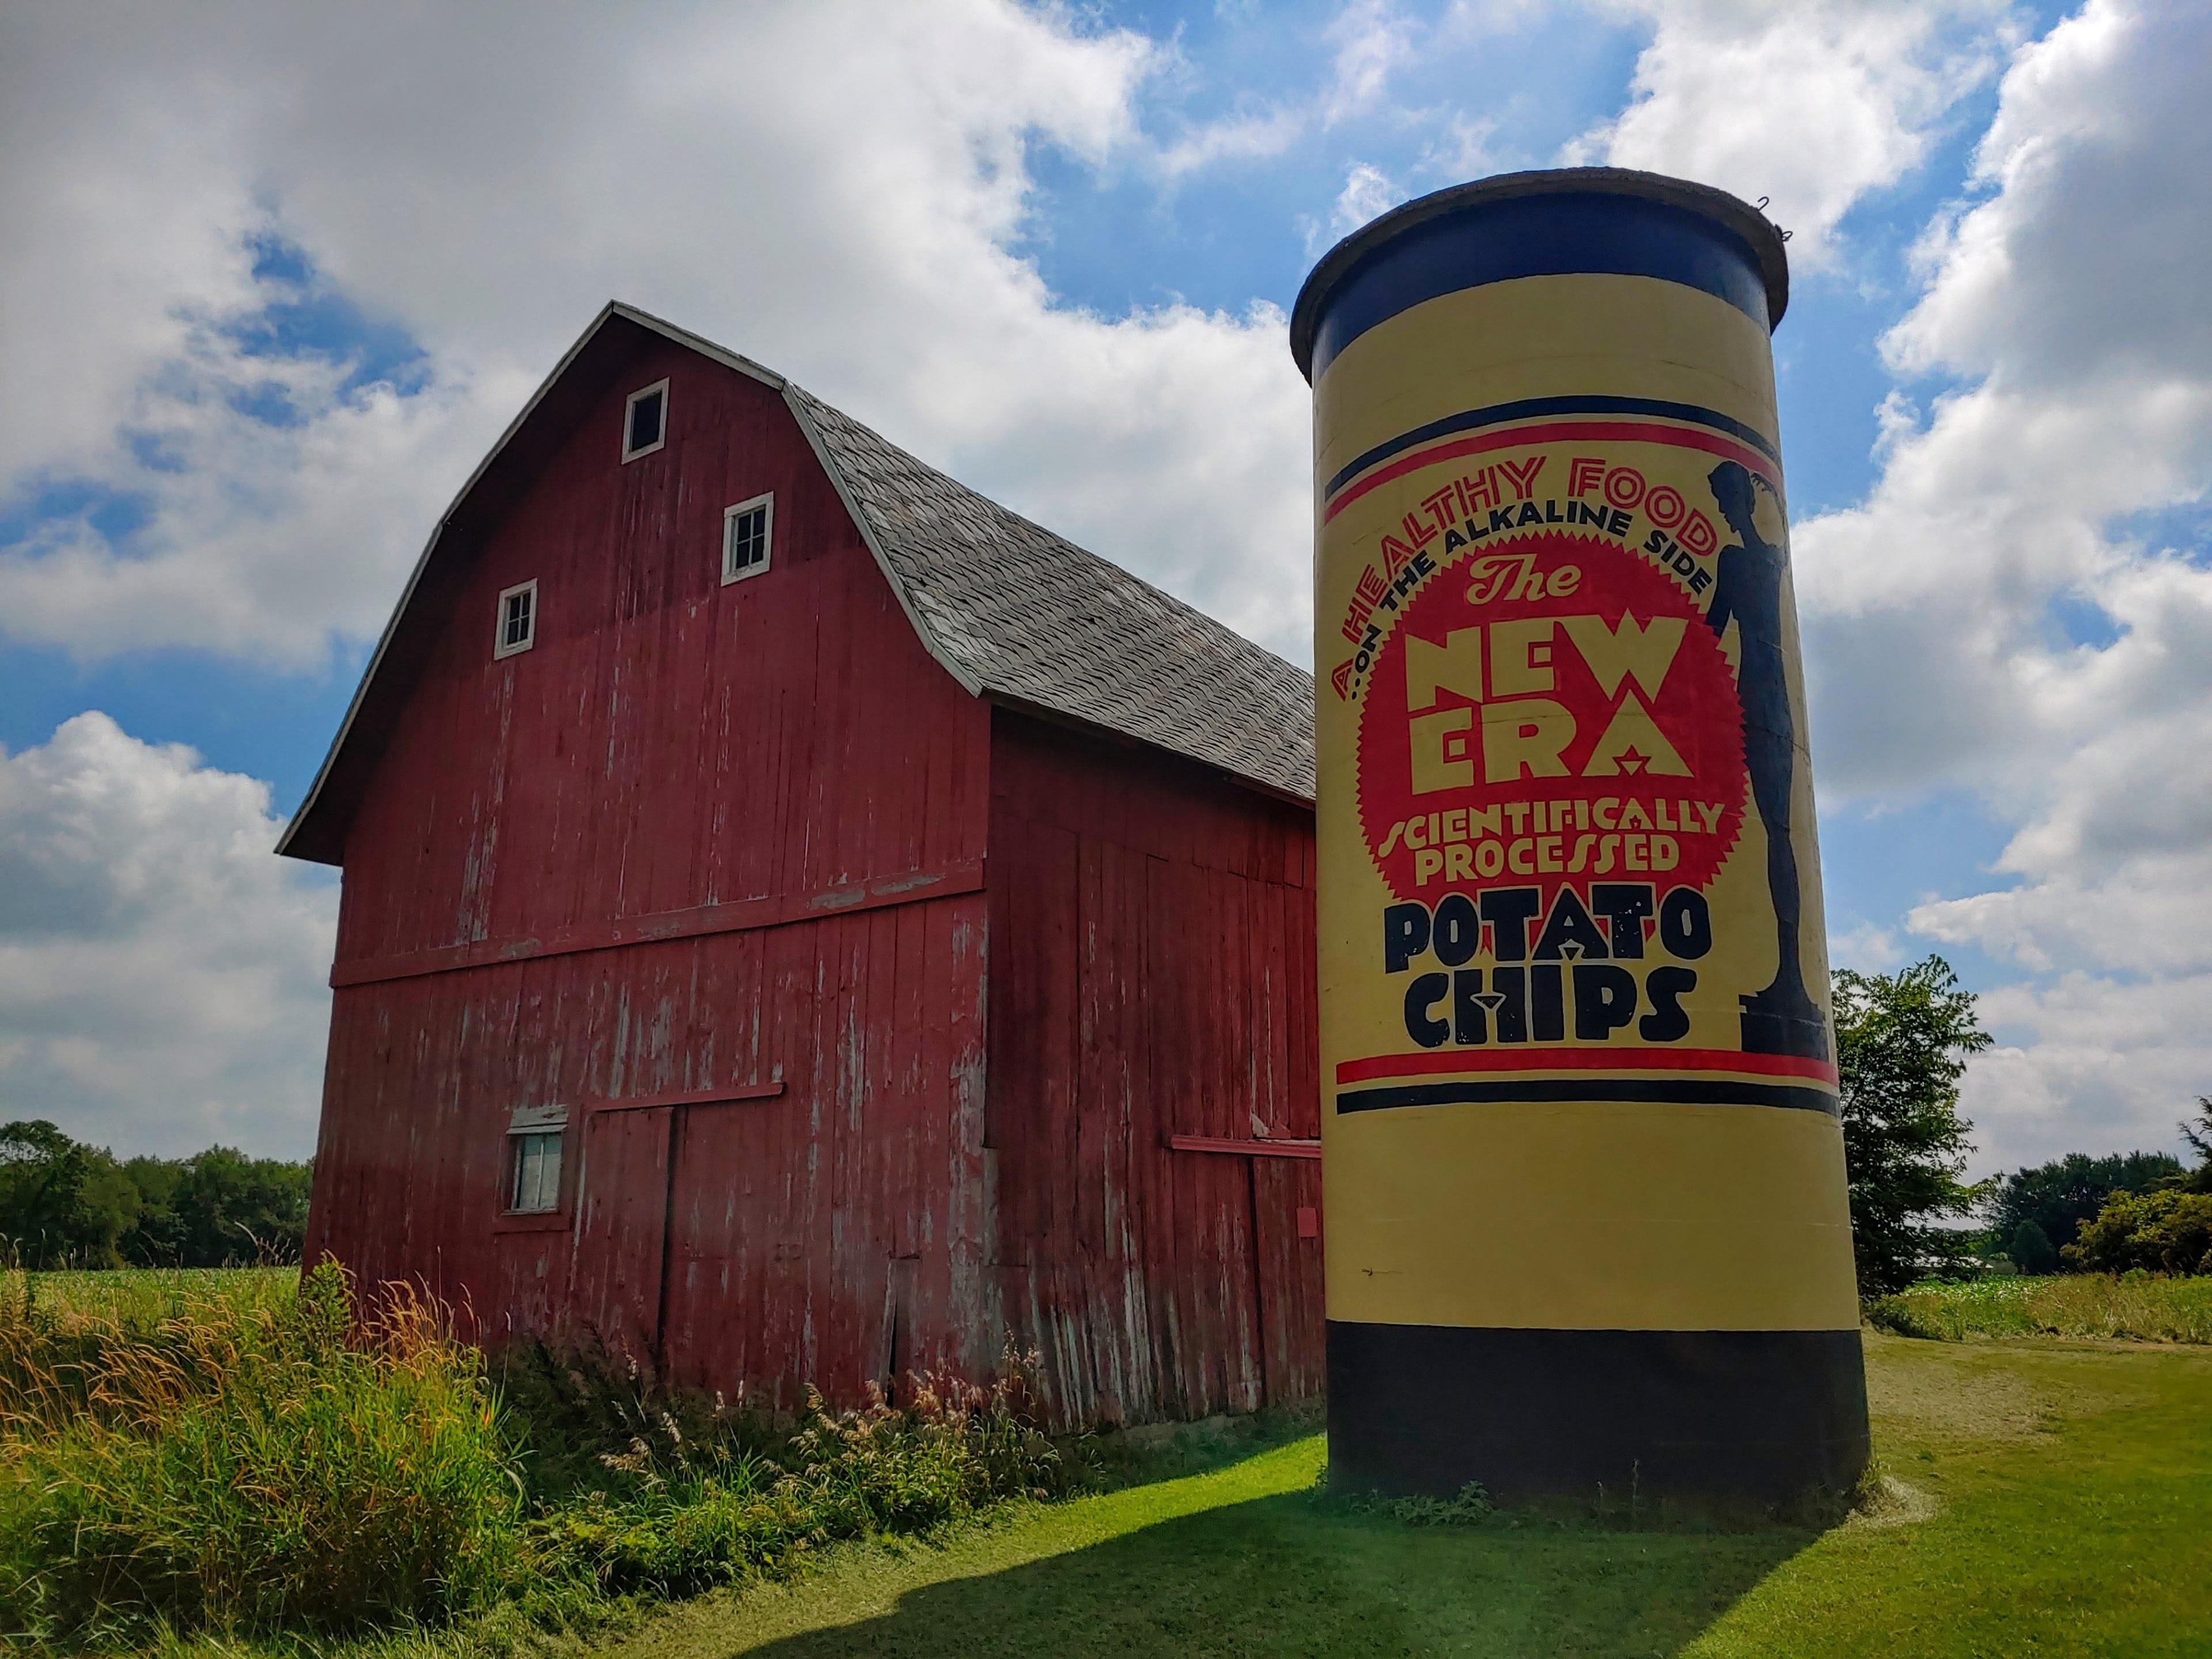 Ionia County, Michigan, United States of America